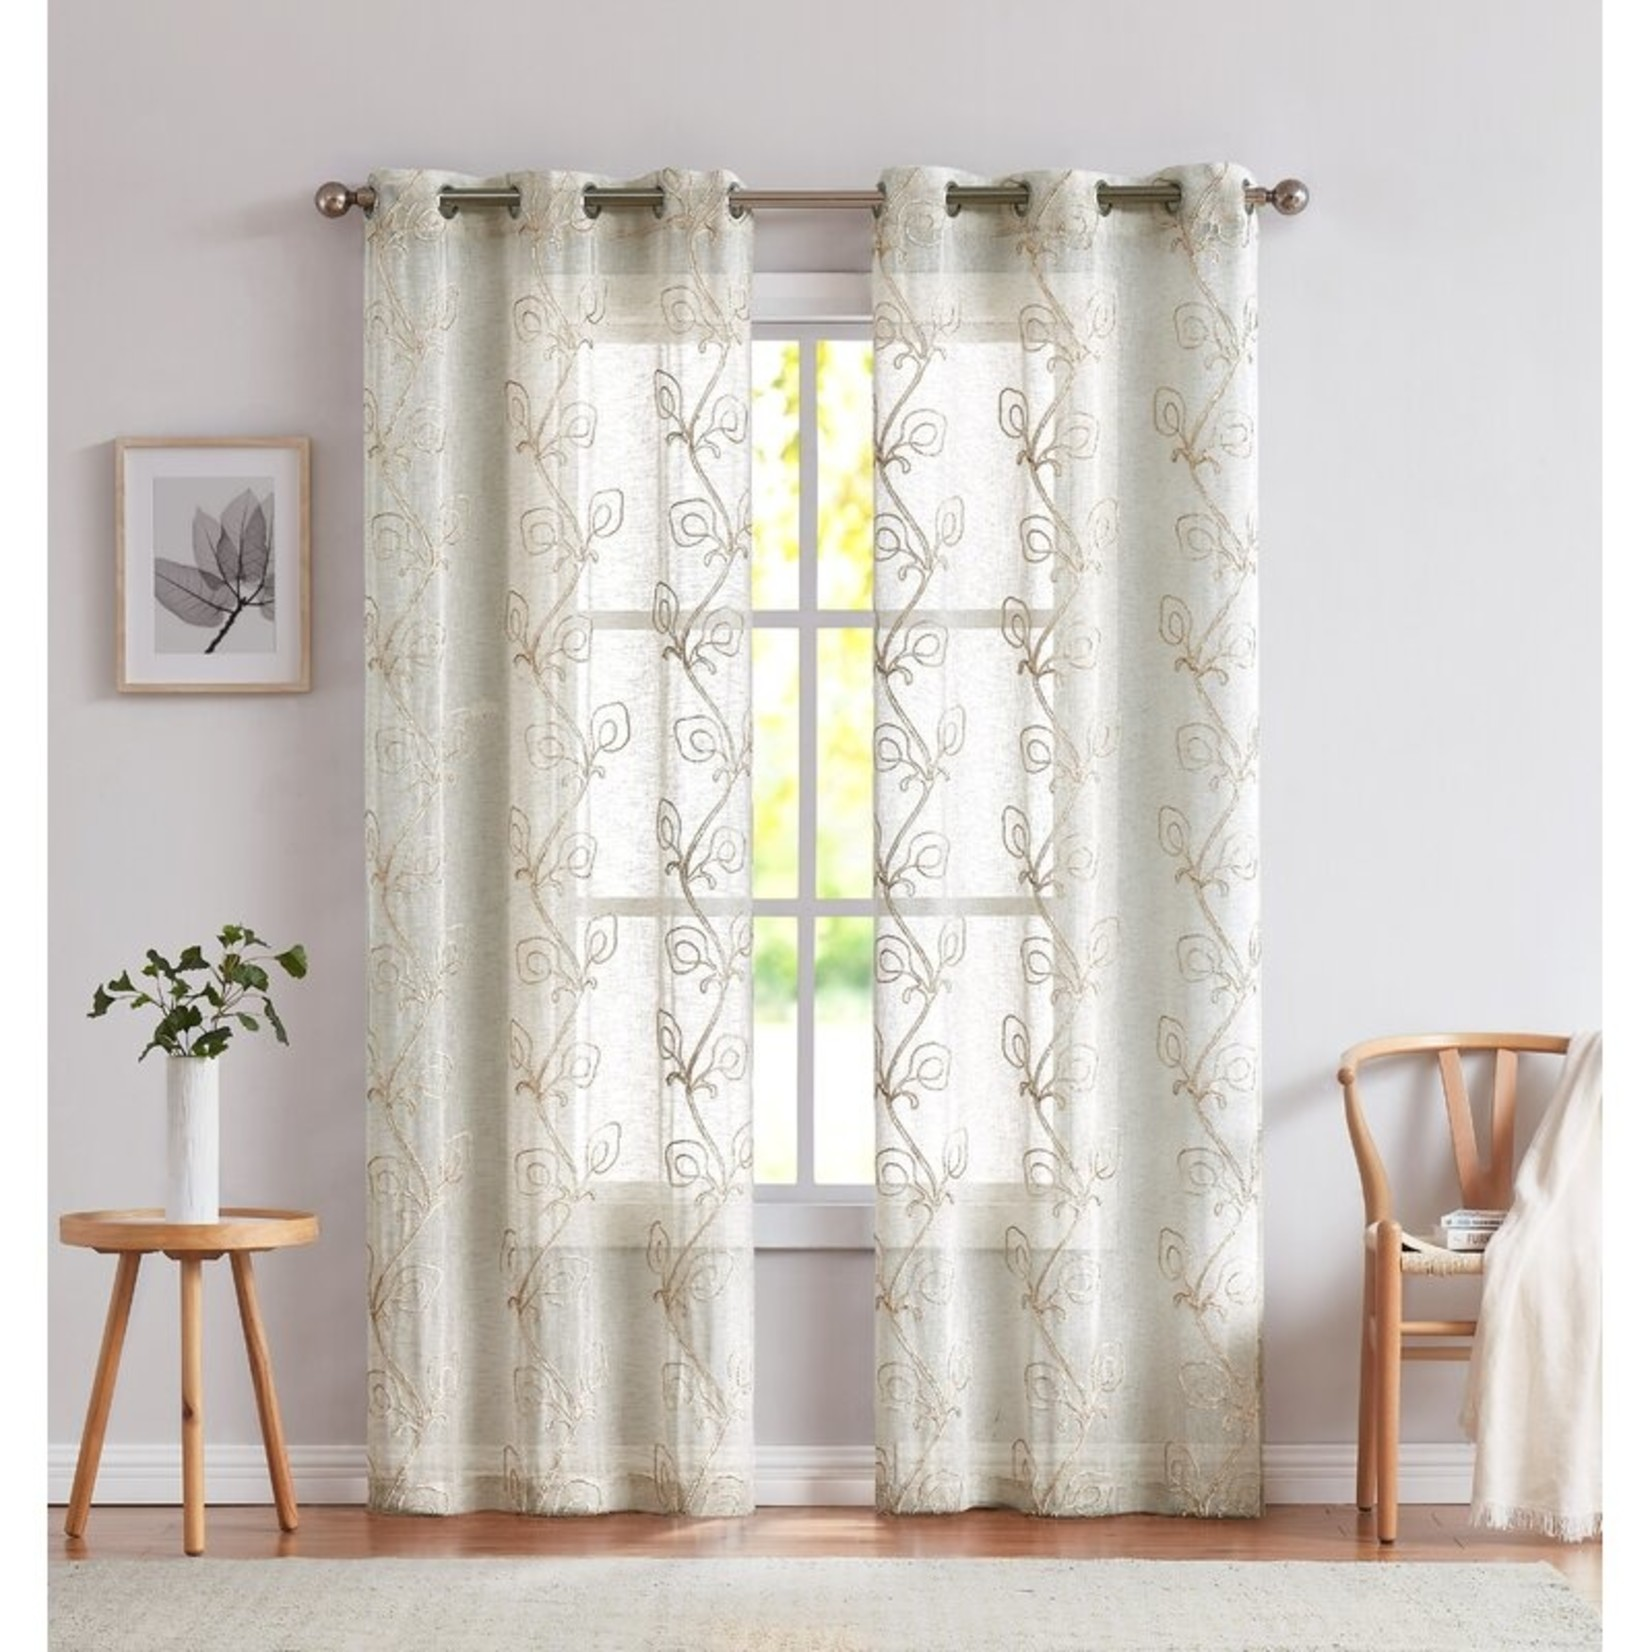 "*Abdal Semi-Sheer Grommet Curtain Panels - 38"" x 84"" - Set of 2"